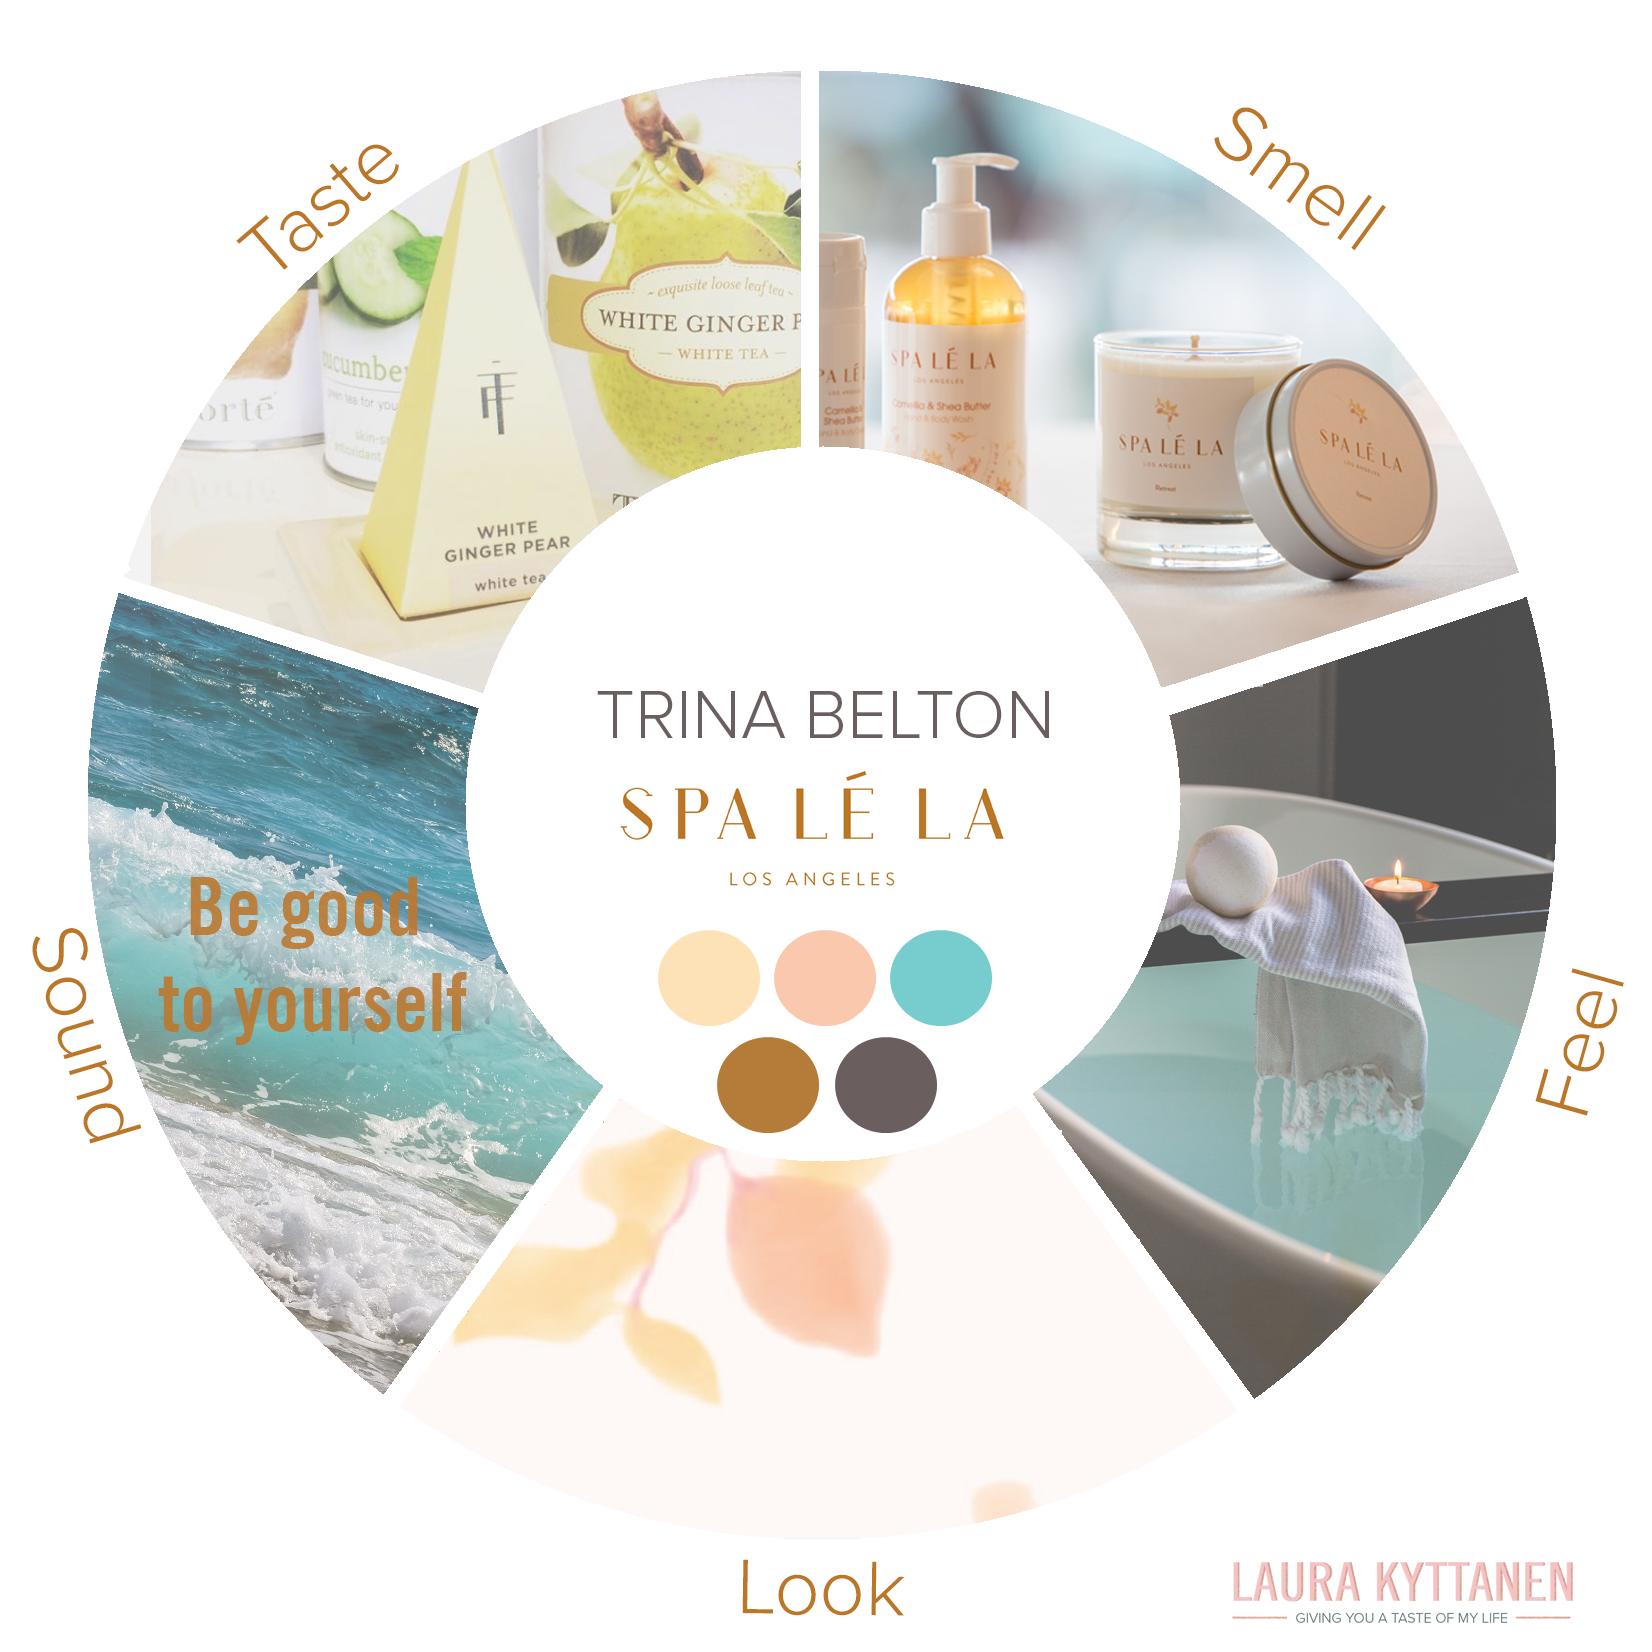 Sensorial Branding Wheel created by Laura Kyttanen for Trina Belton, Founder of  Spa Lé La